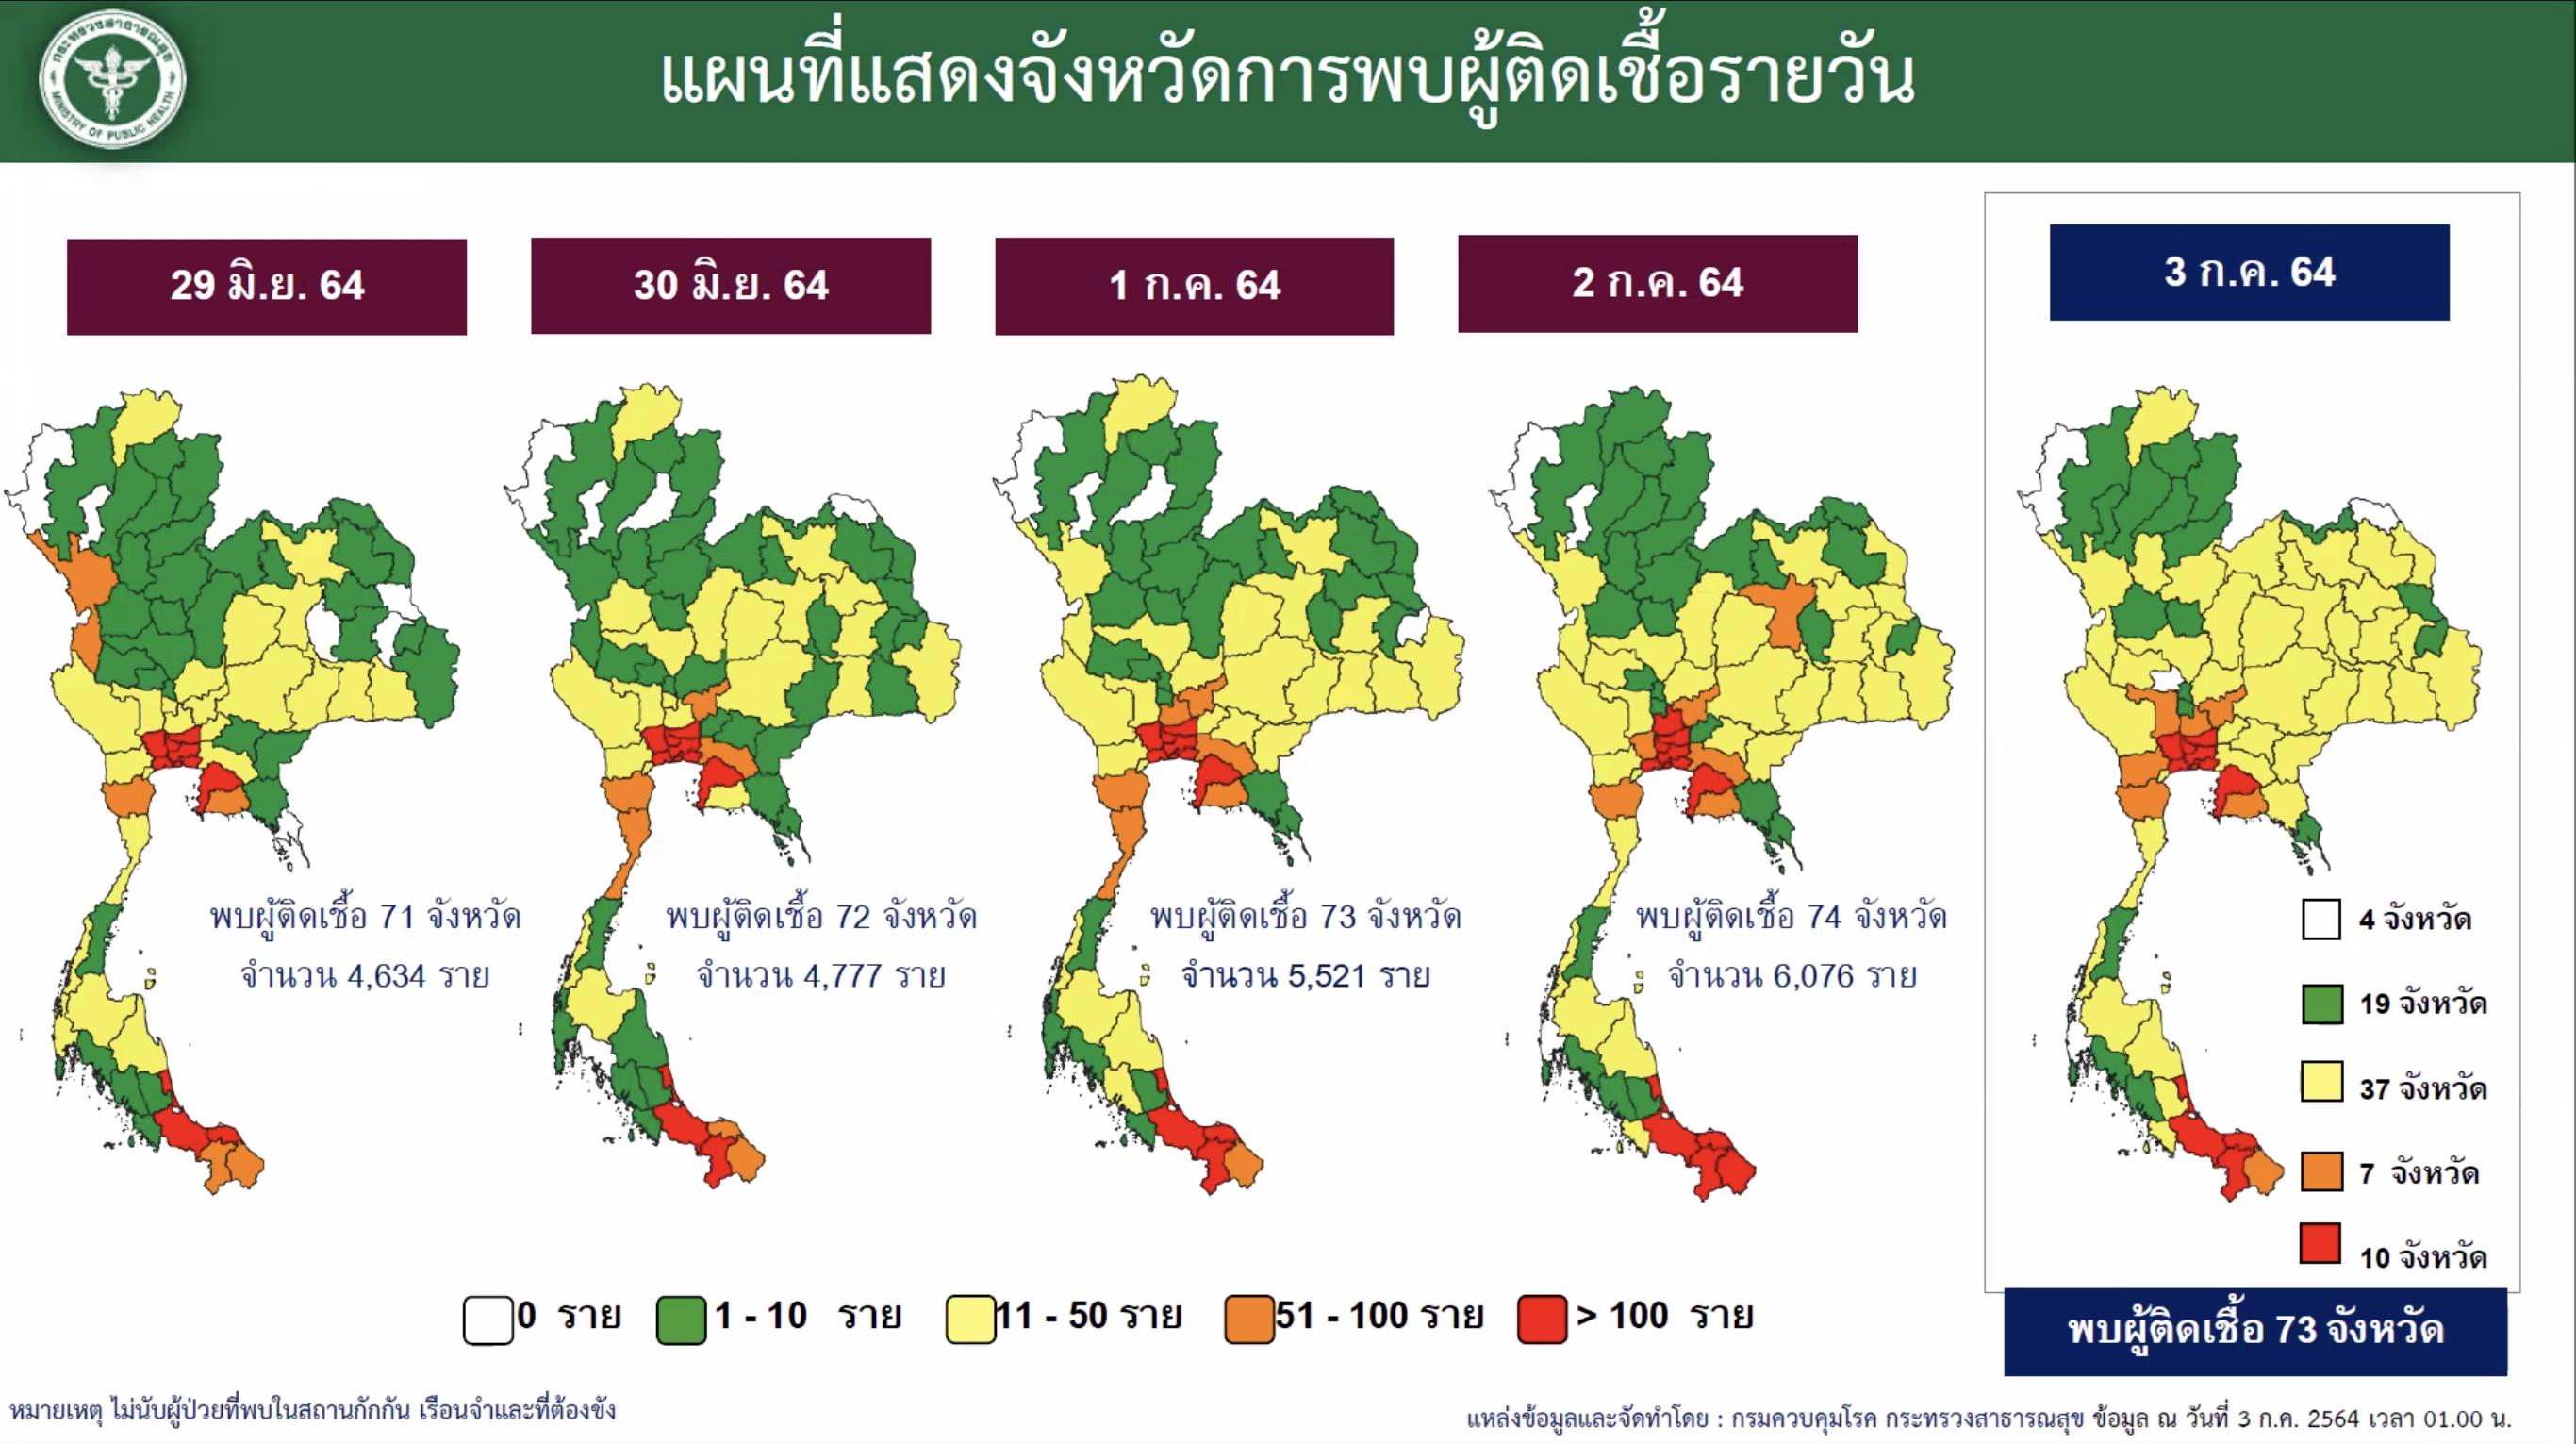 www.thaiguide.dk/images/forum/covid19/smitteudviklingen%20uge%2003-07-21.jpg